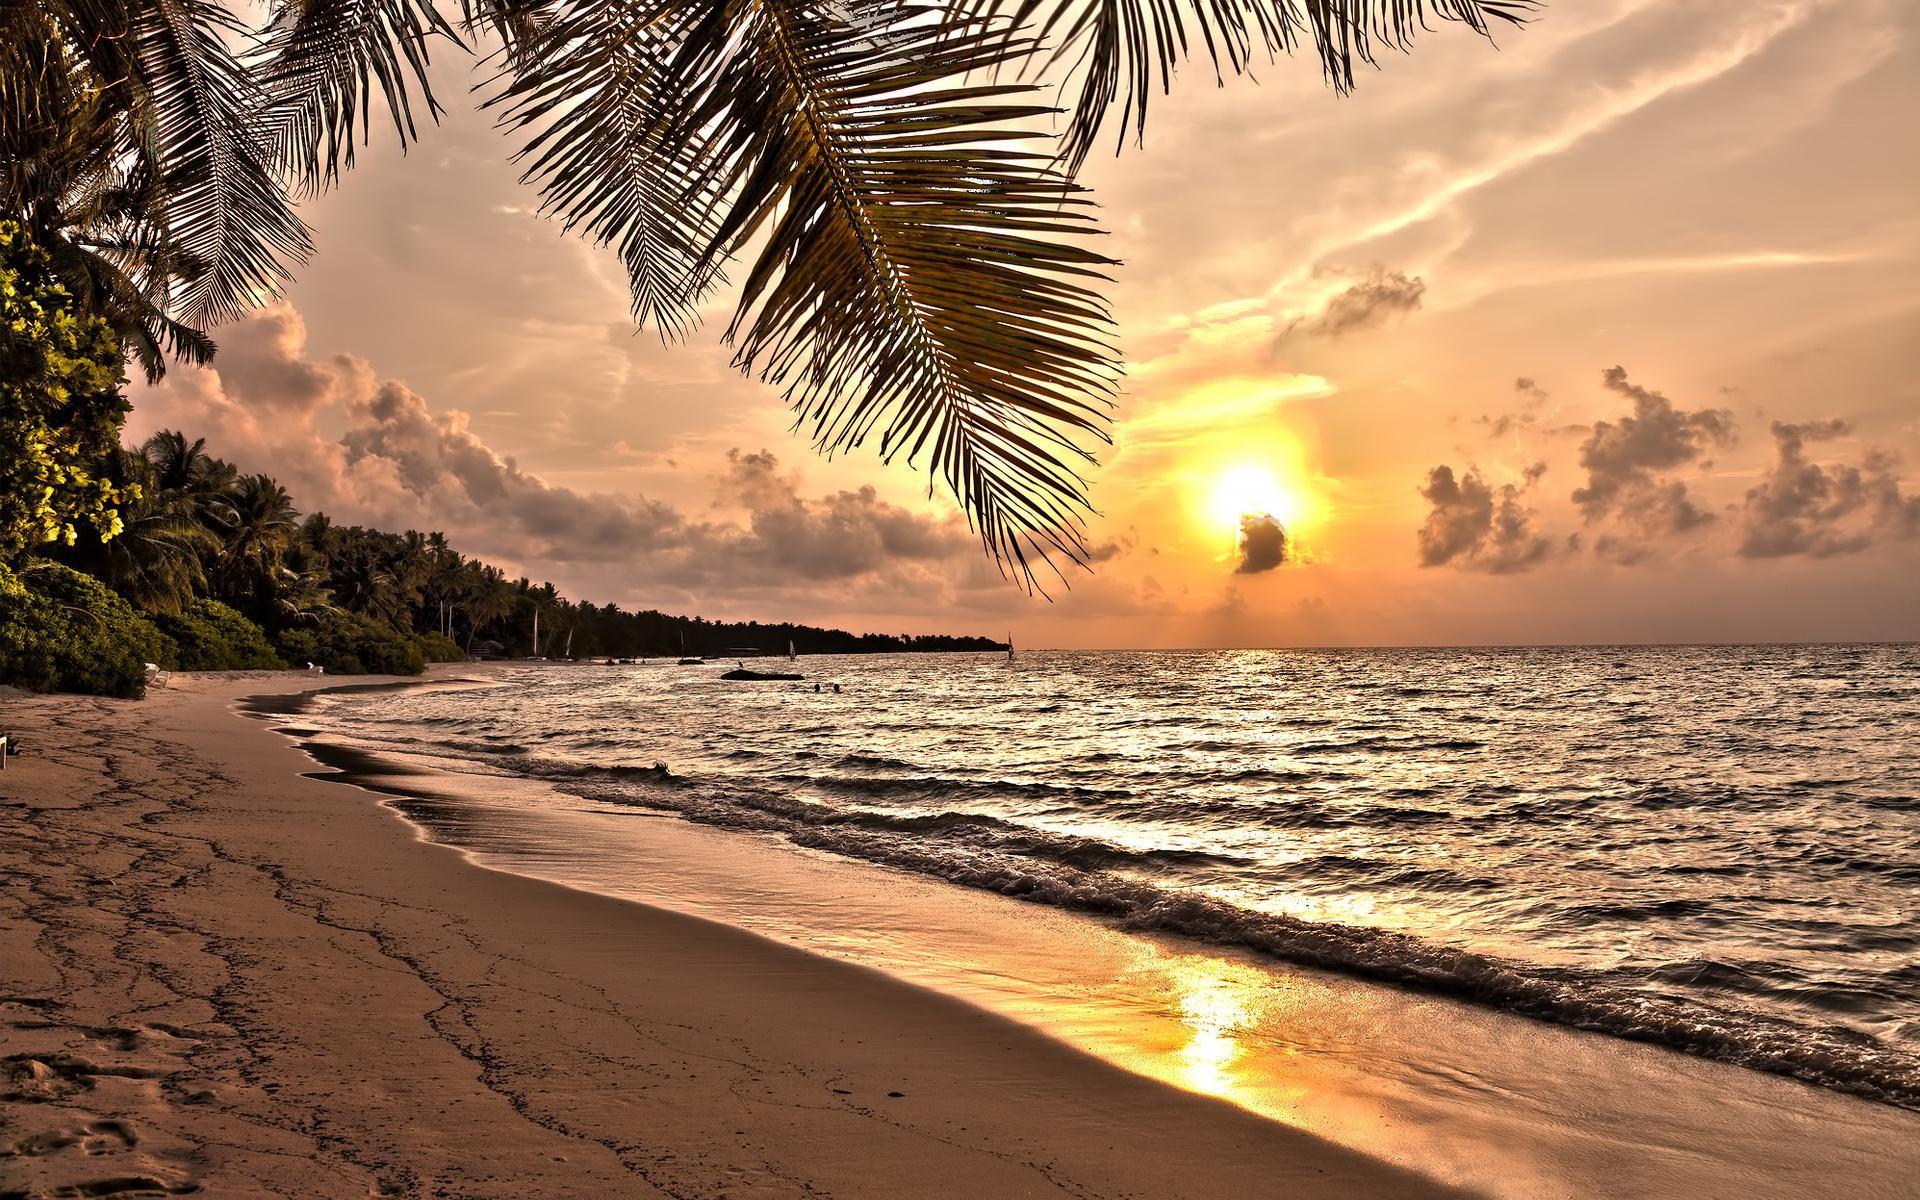 magnificent-sunset-over-tropical-beach-wallpaper-535f989c95808.jpg (